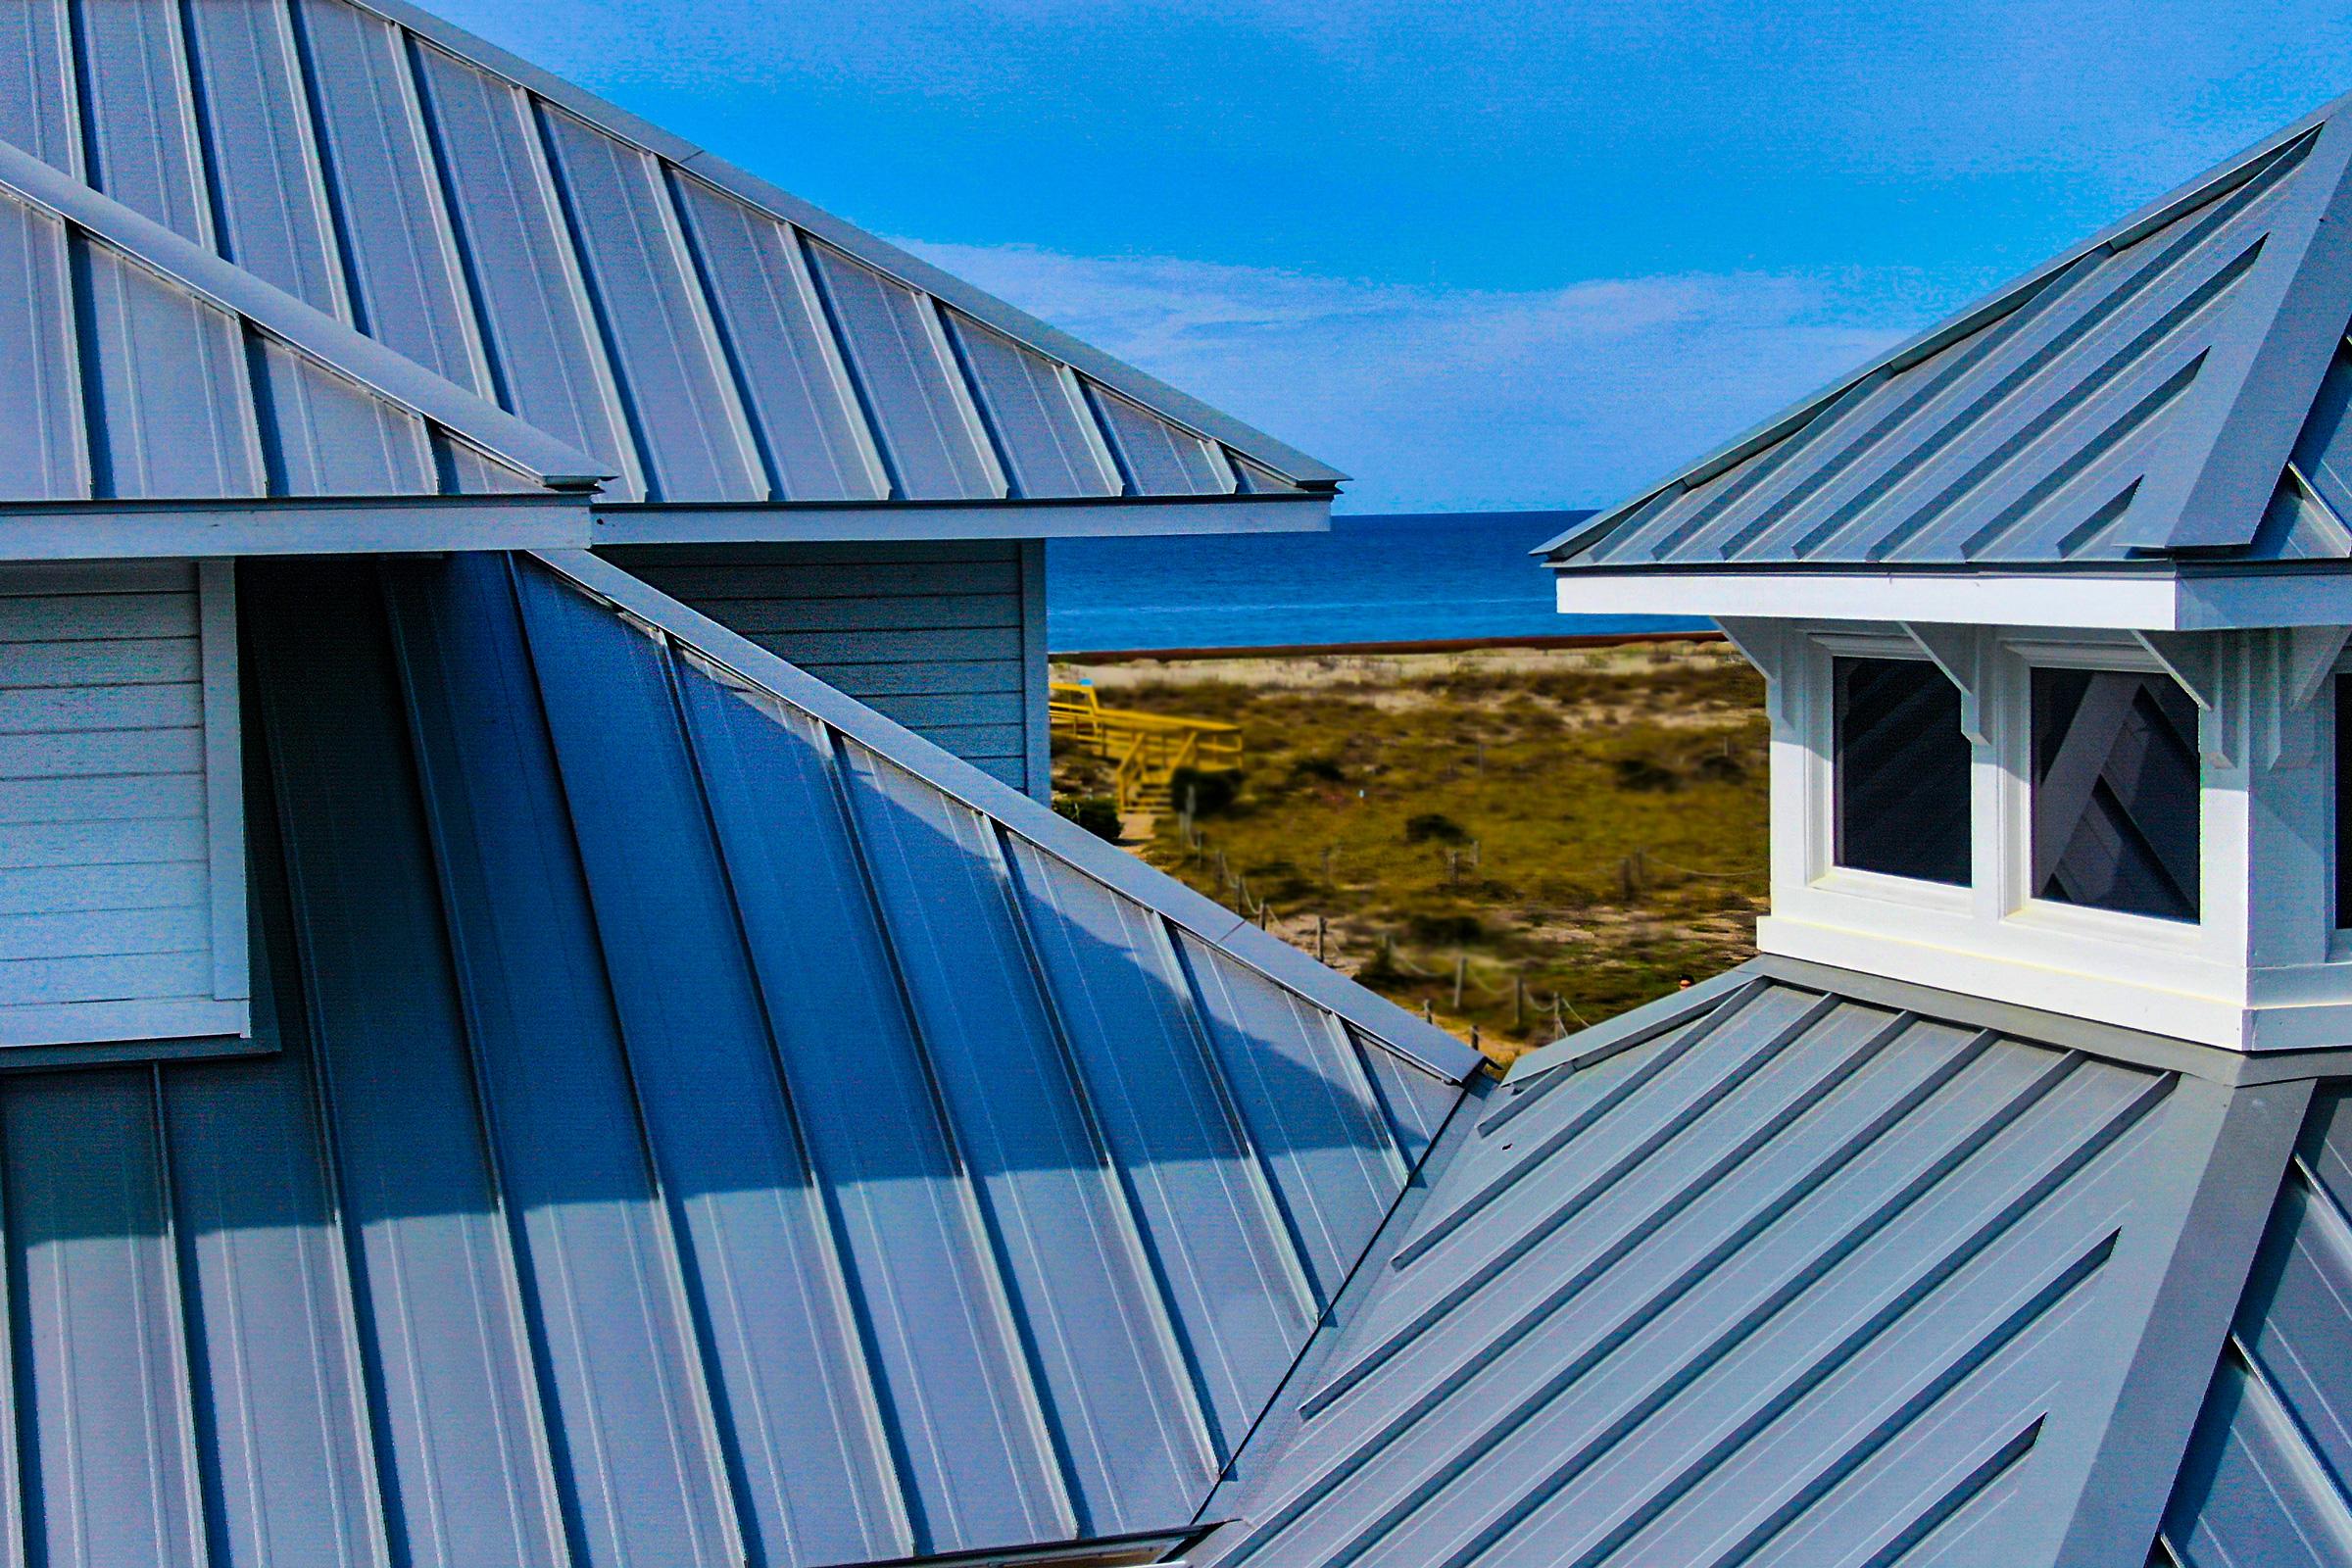 custom metal roof englert gbdmagazine 04